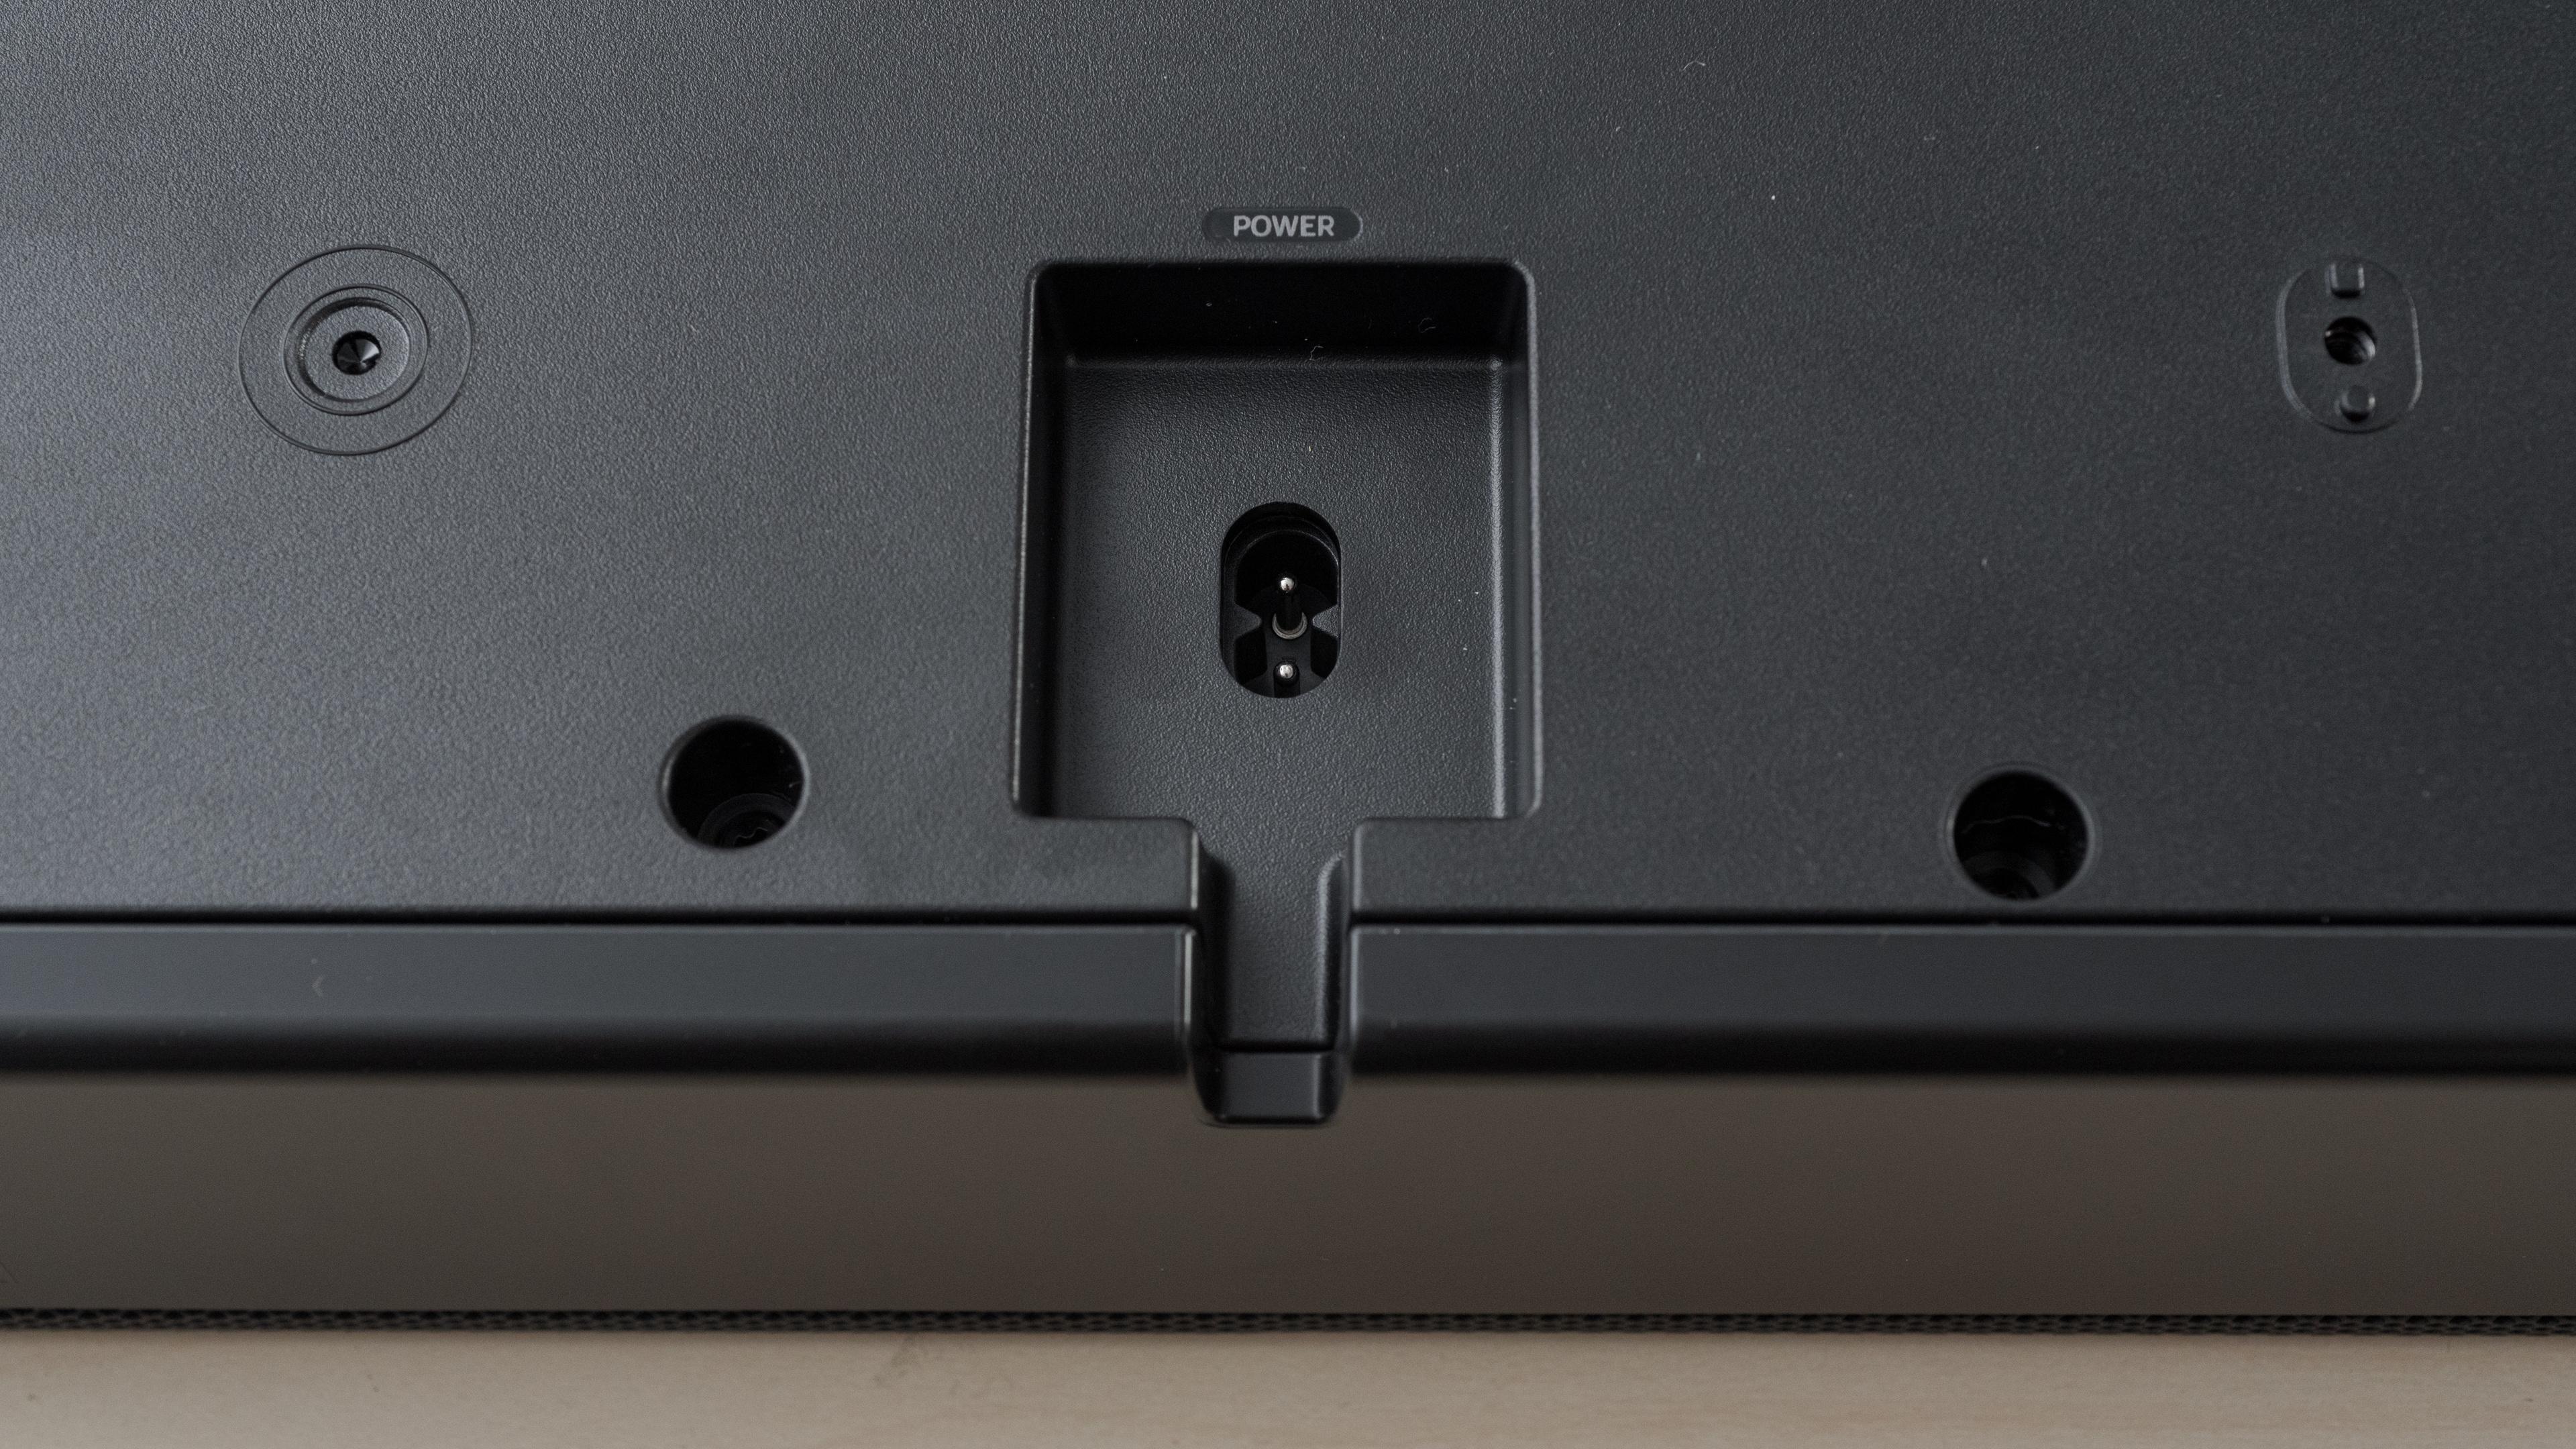 Samsung HW-Q90R Harman Kardon Barra de sonido cinematográfica con Dolby Atmos